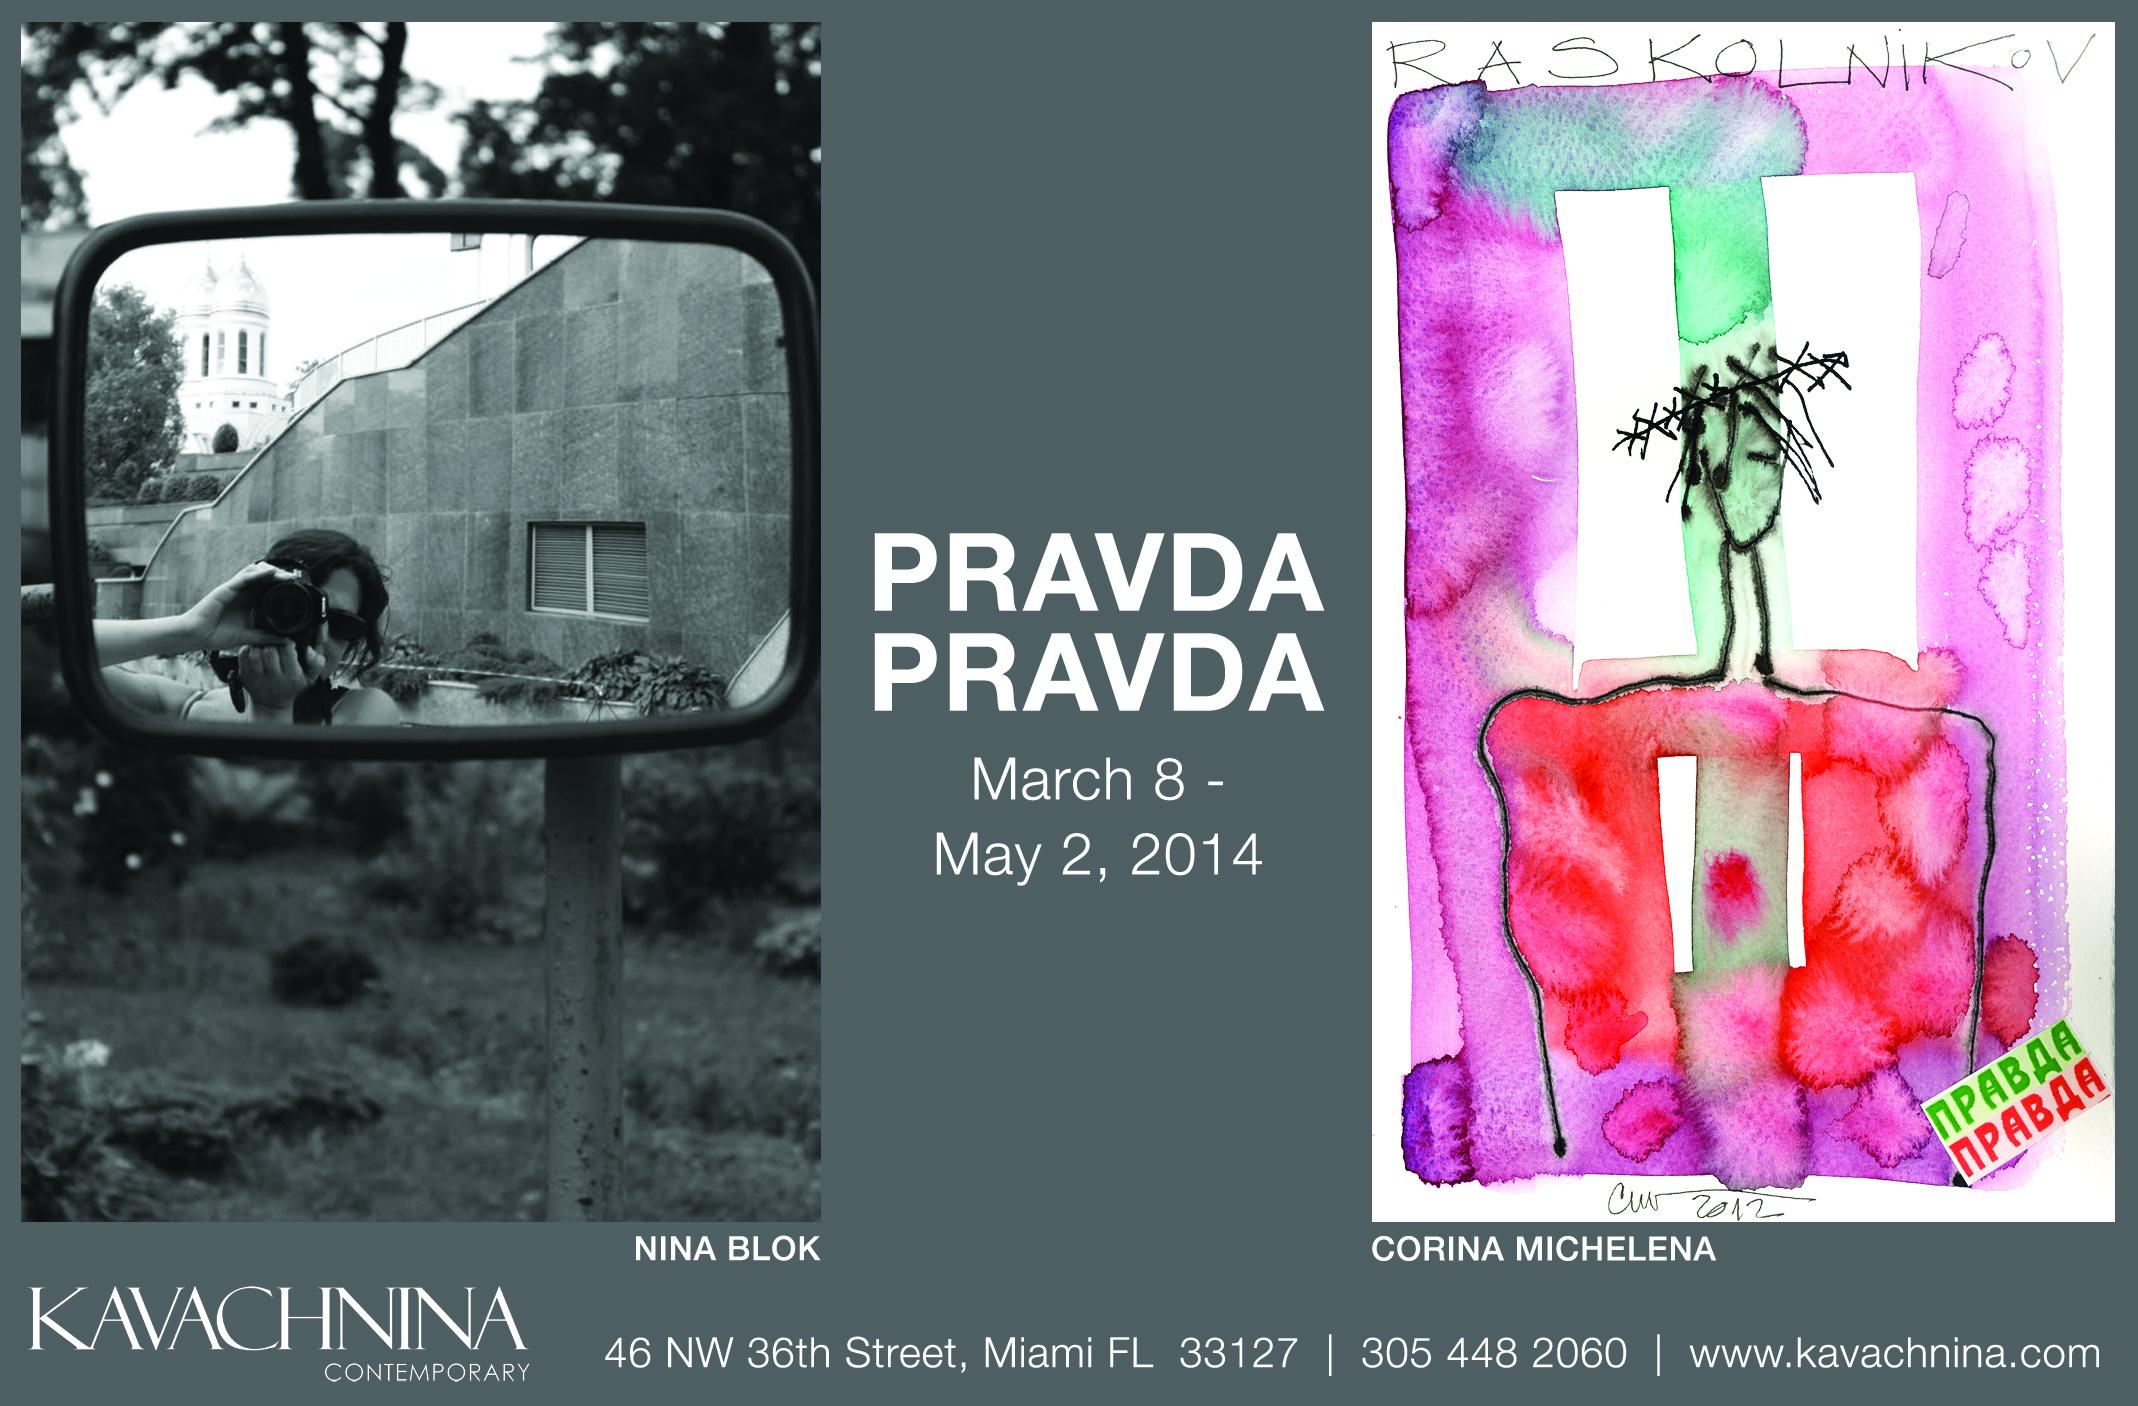 KAVACHNINA ARTDISRICTS FEB MAR 2014